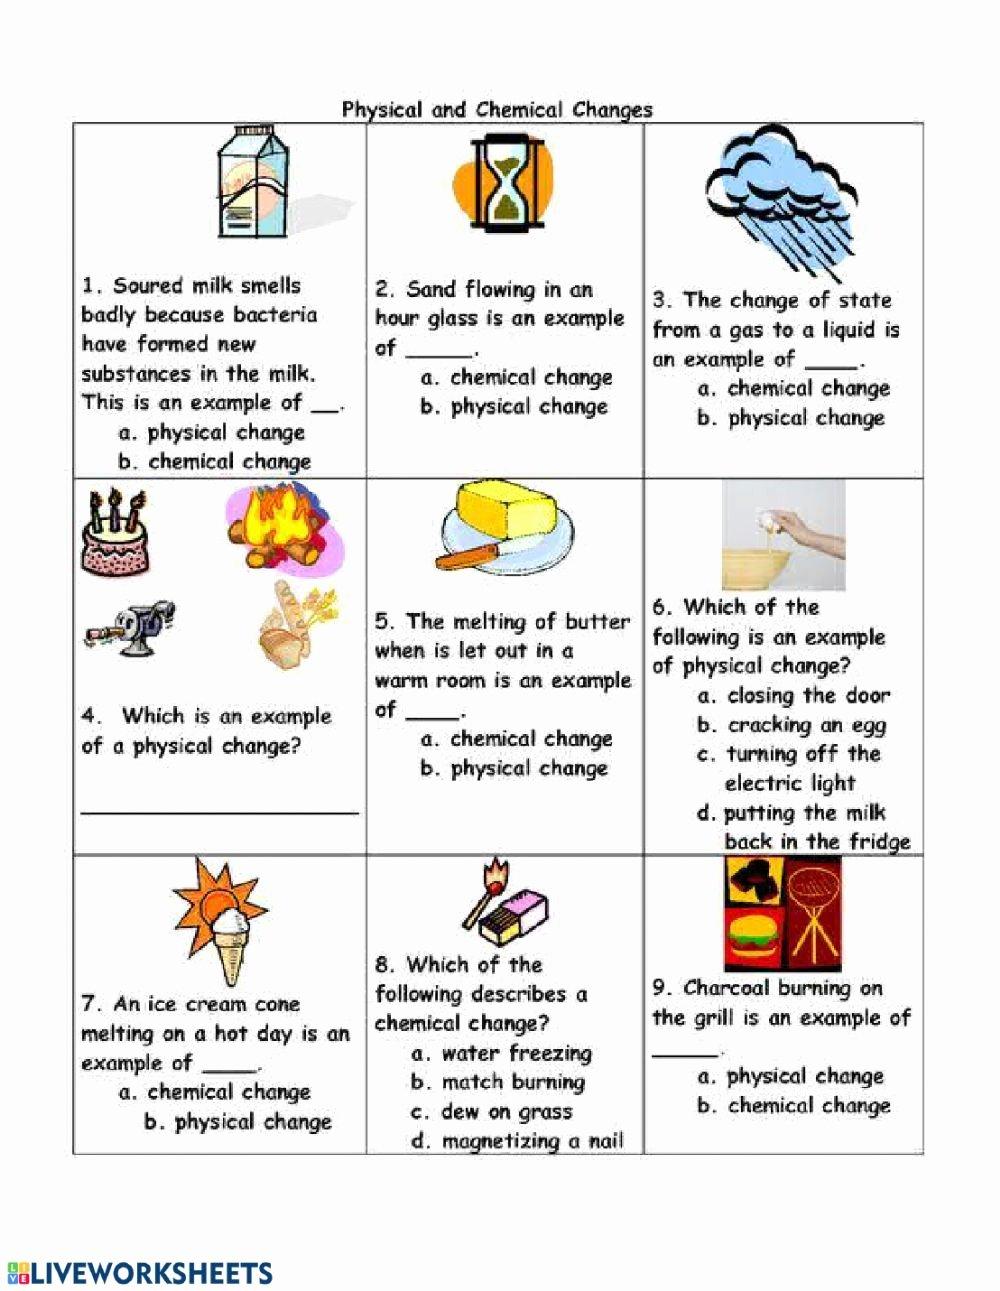 Physical Vs Chemical Changes Worksheet Lovely Physical and Chemical Changes Interactive Worksheet